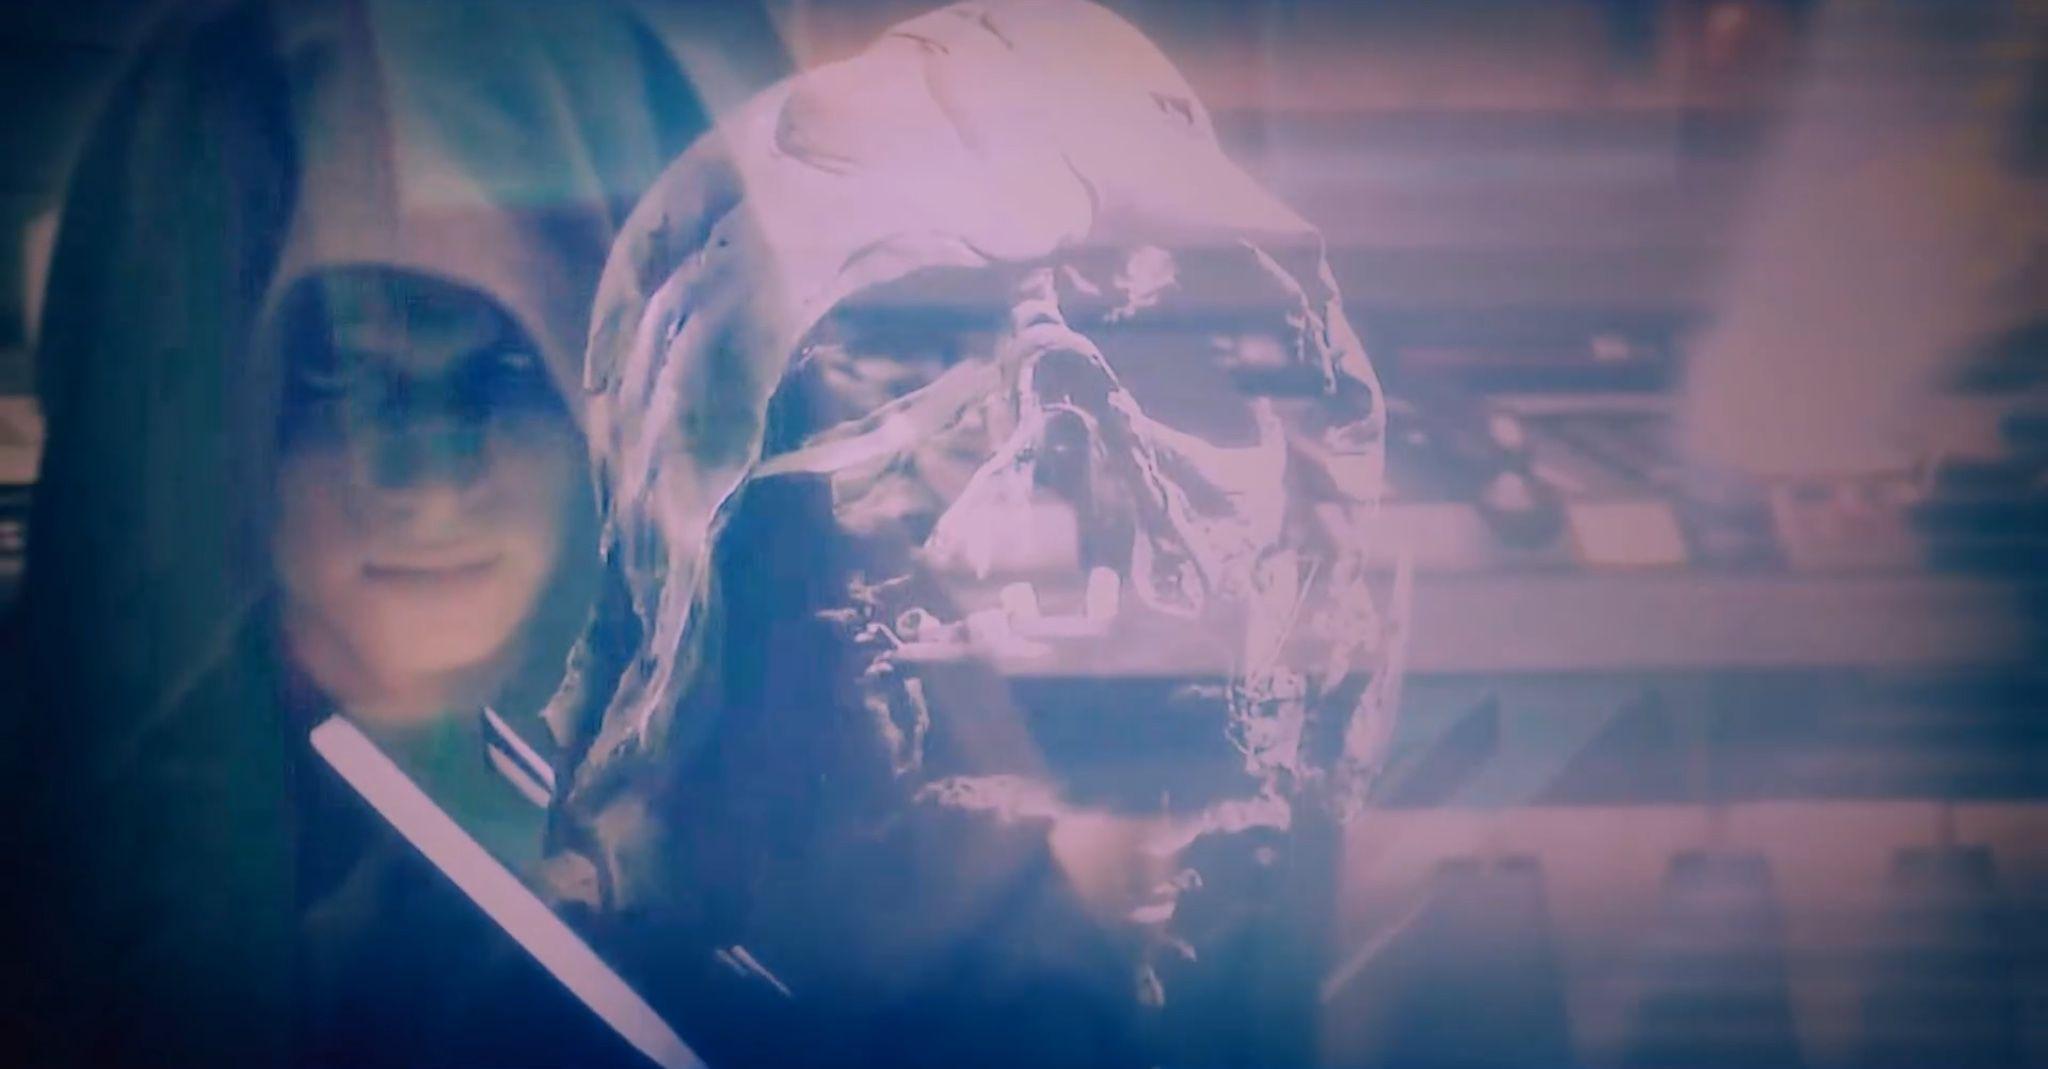 He is still Anakin skywalker behind the mask.